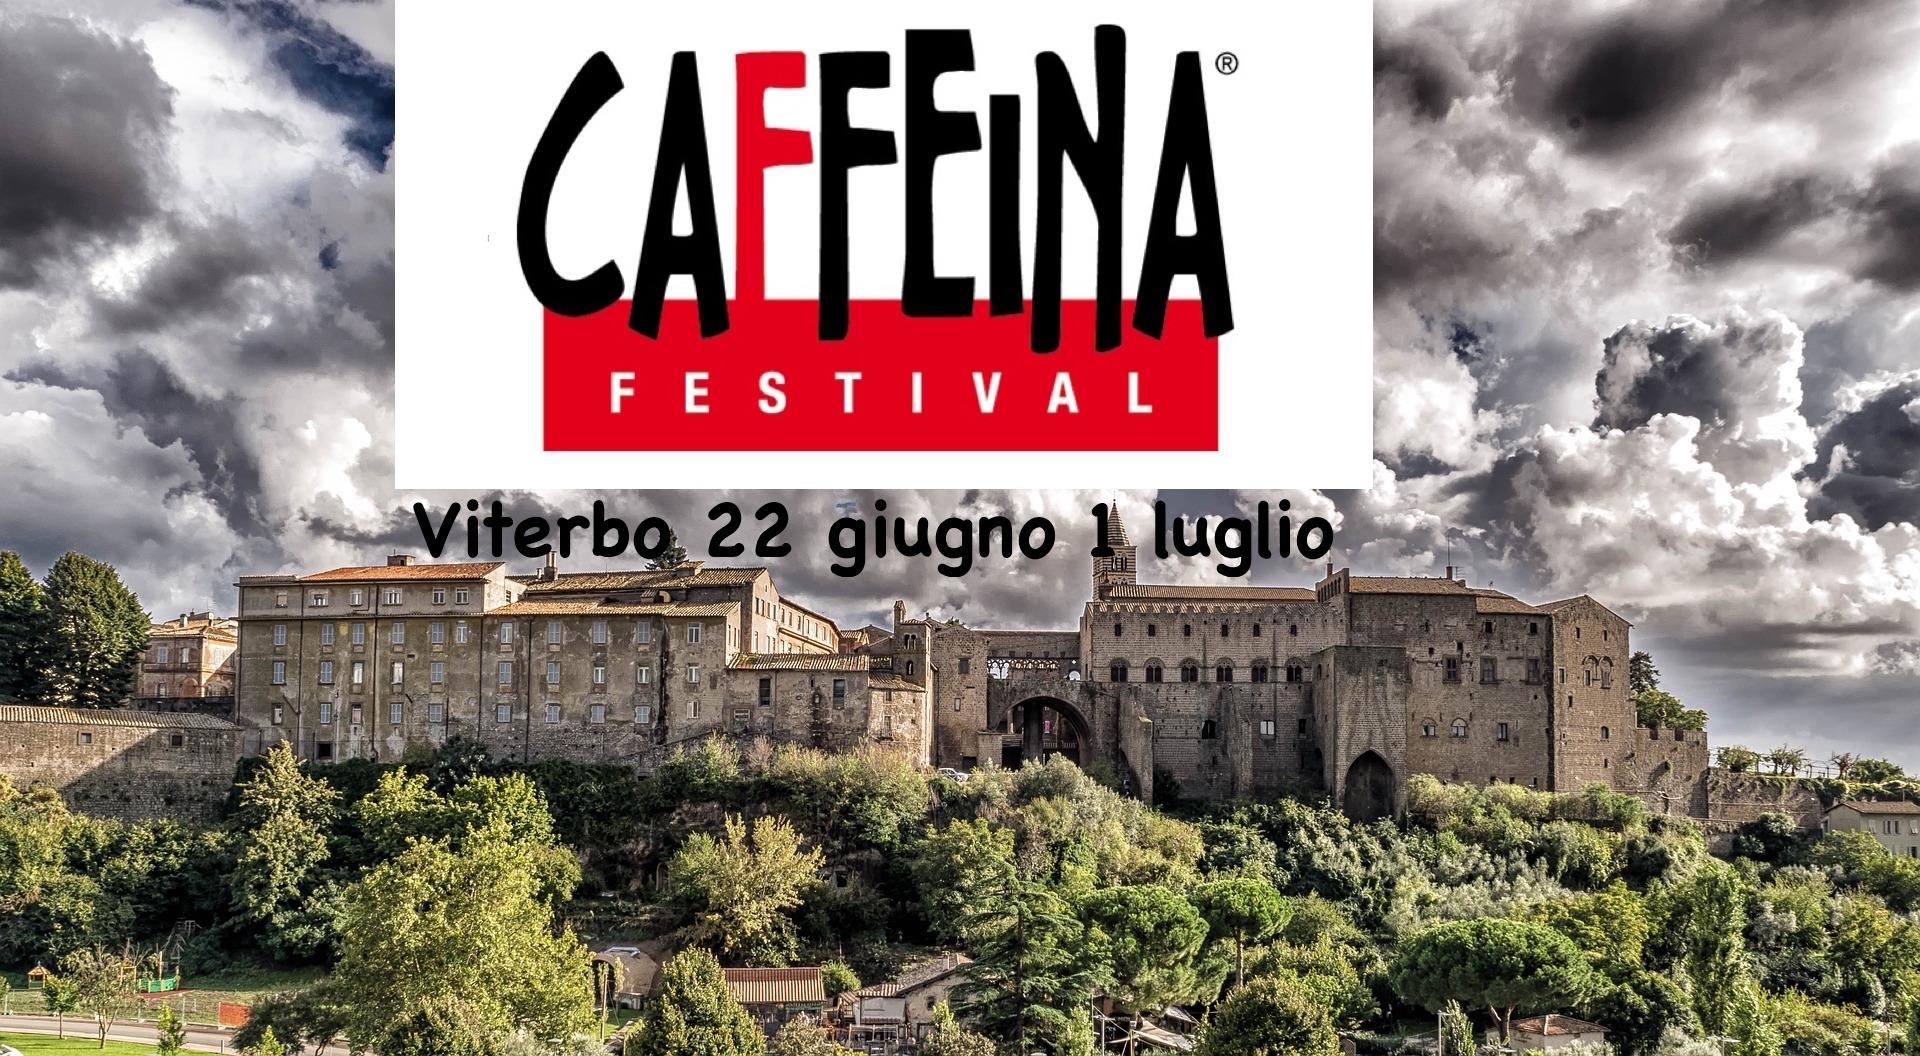 Caffeina Festival